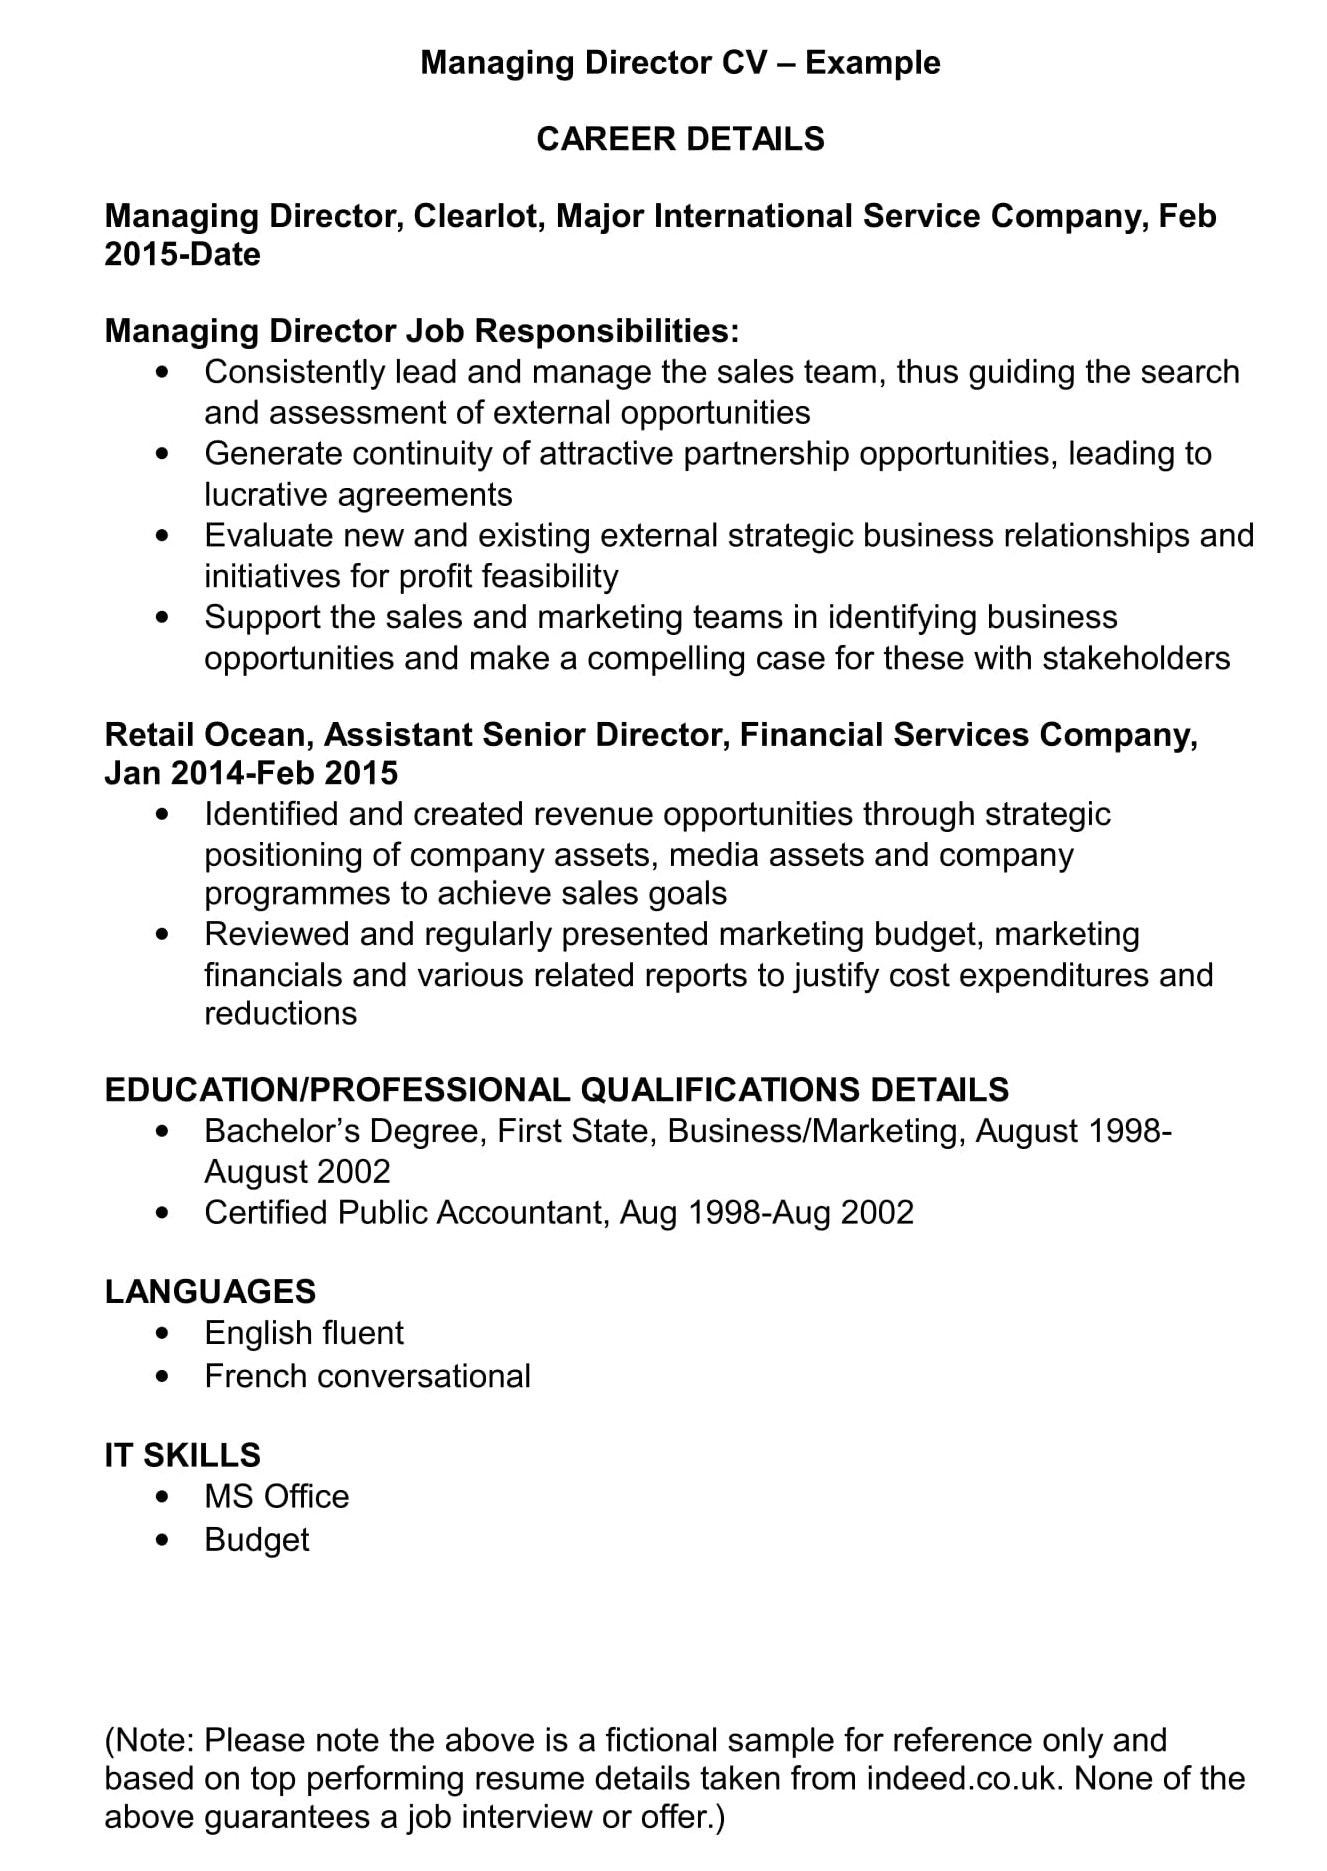 managing director cv template and examples renaix